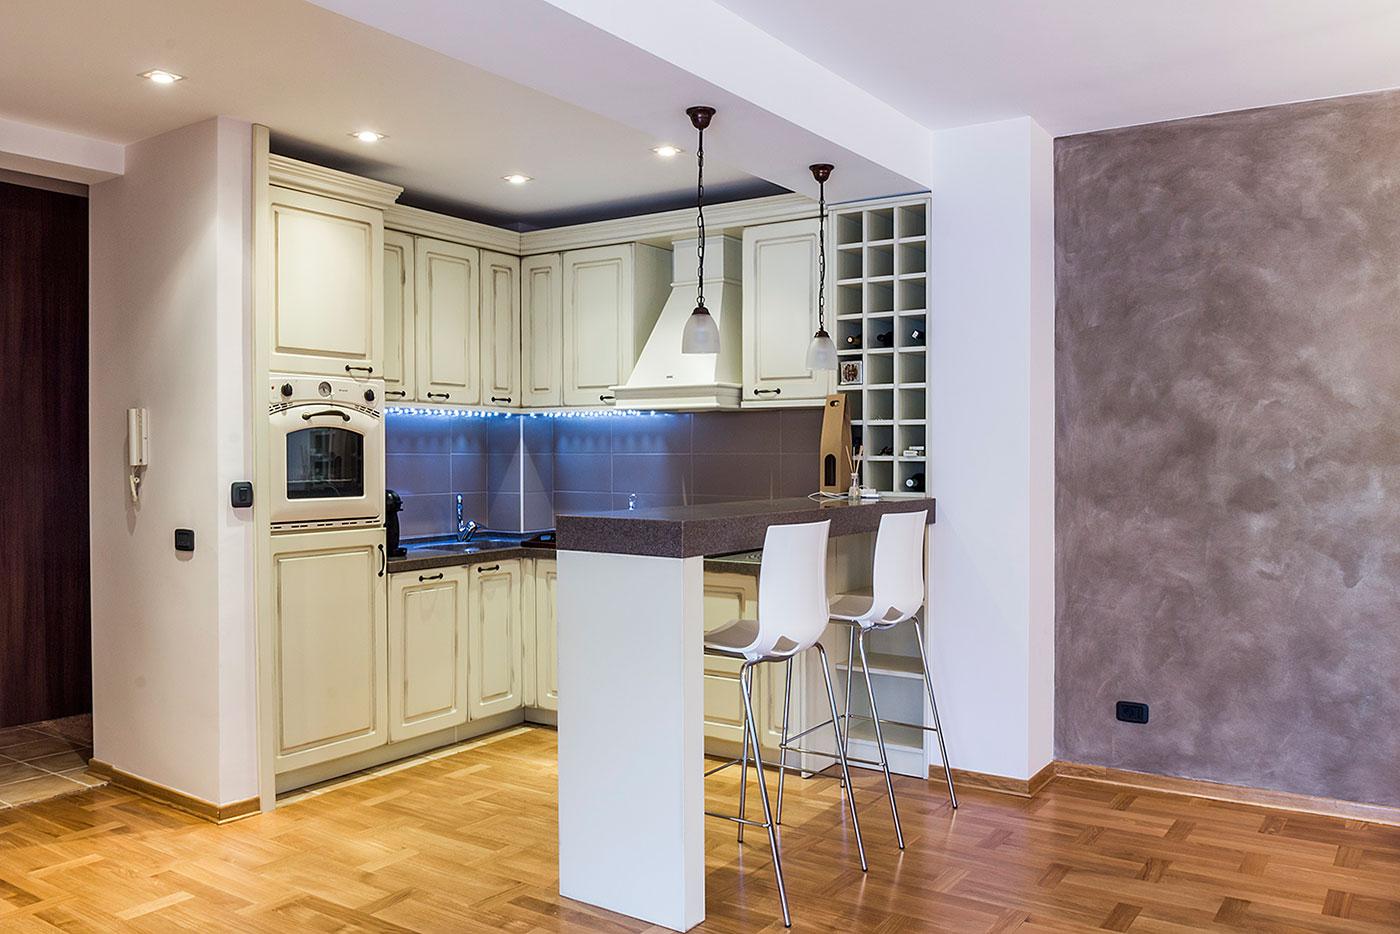 kuhinje gorenje rustika 20170803105540 zanimljive ideje za dizajn svoj dom. Black Bedroom Furniture Sets. Home Design Ideas